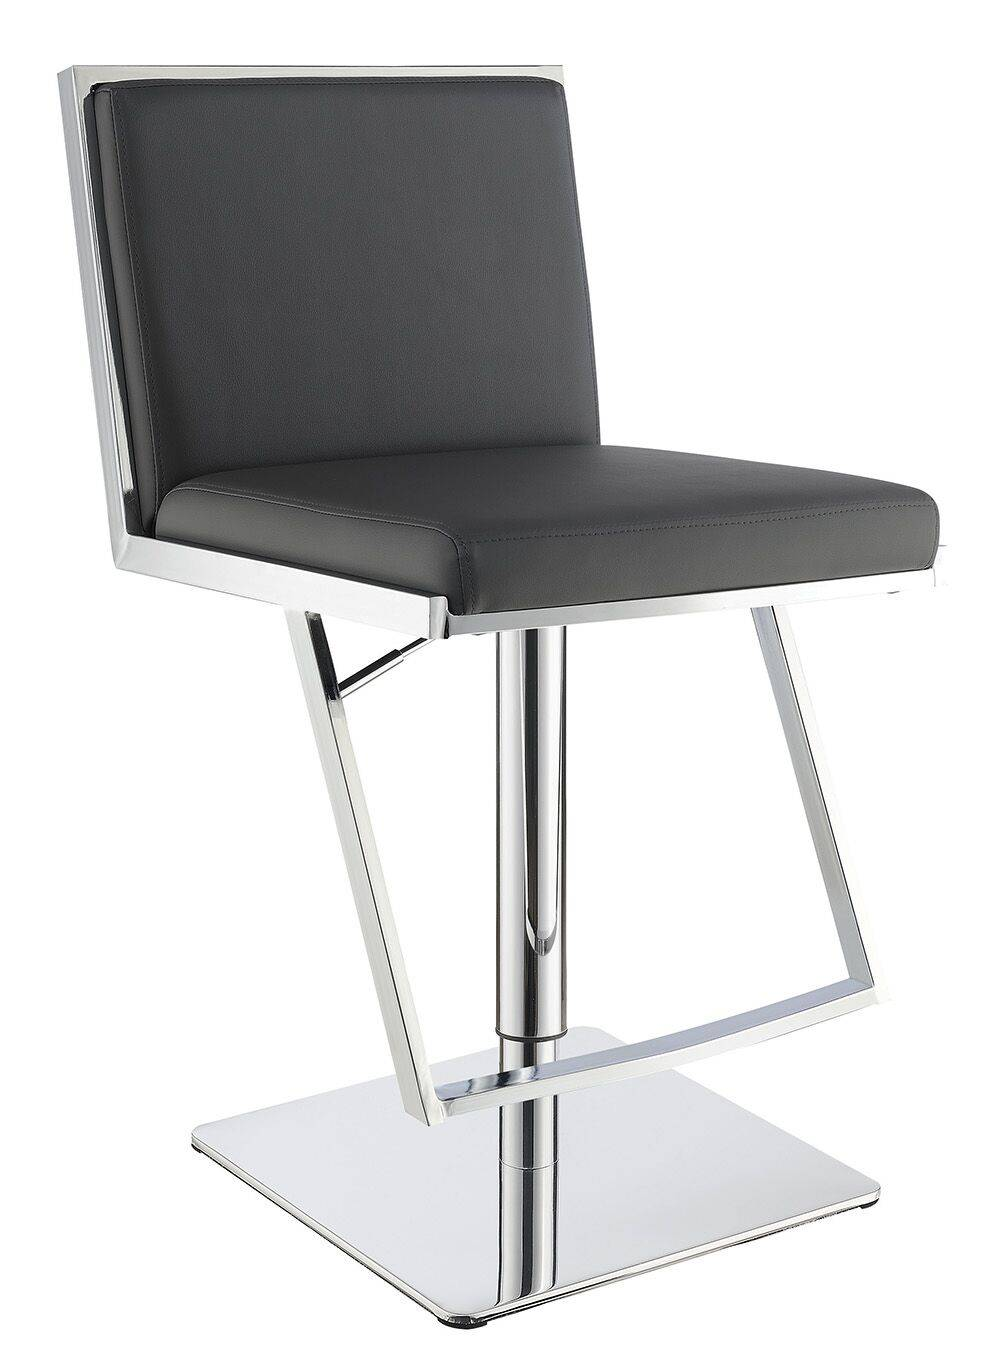 Dixon grey leatherette barstool modern